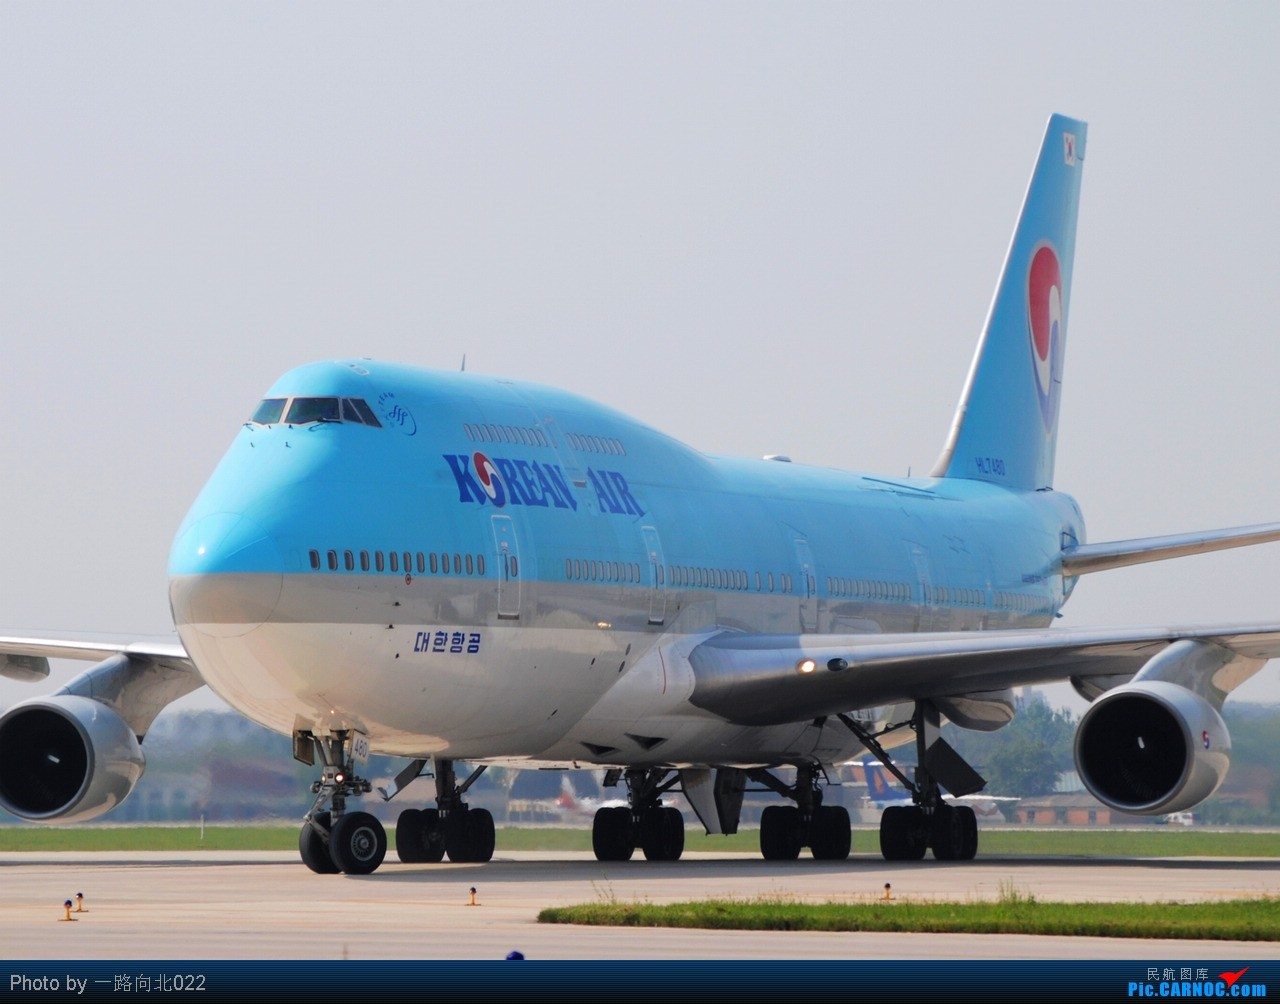 Re:**TSN**TSN** 踏踏实实发图 不能急功近利 BOEING 747-400F HL7480 中国天津滨海机场